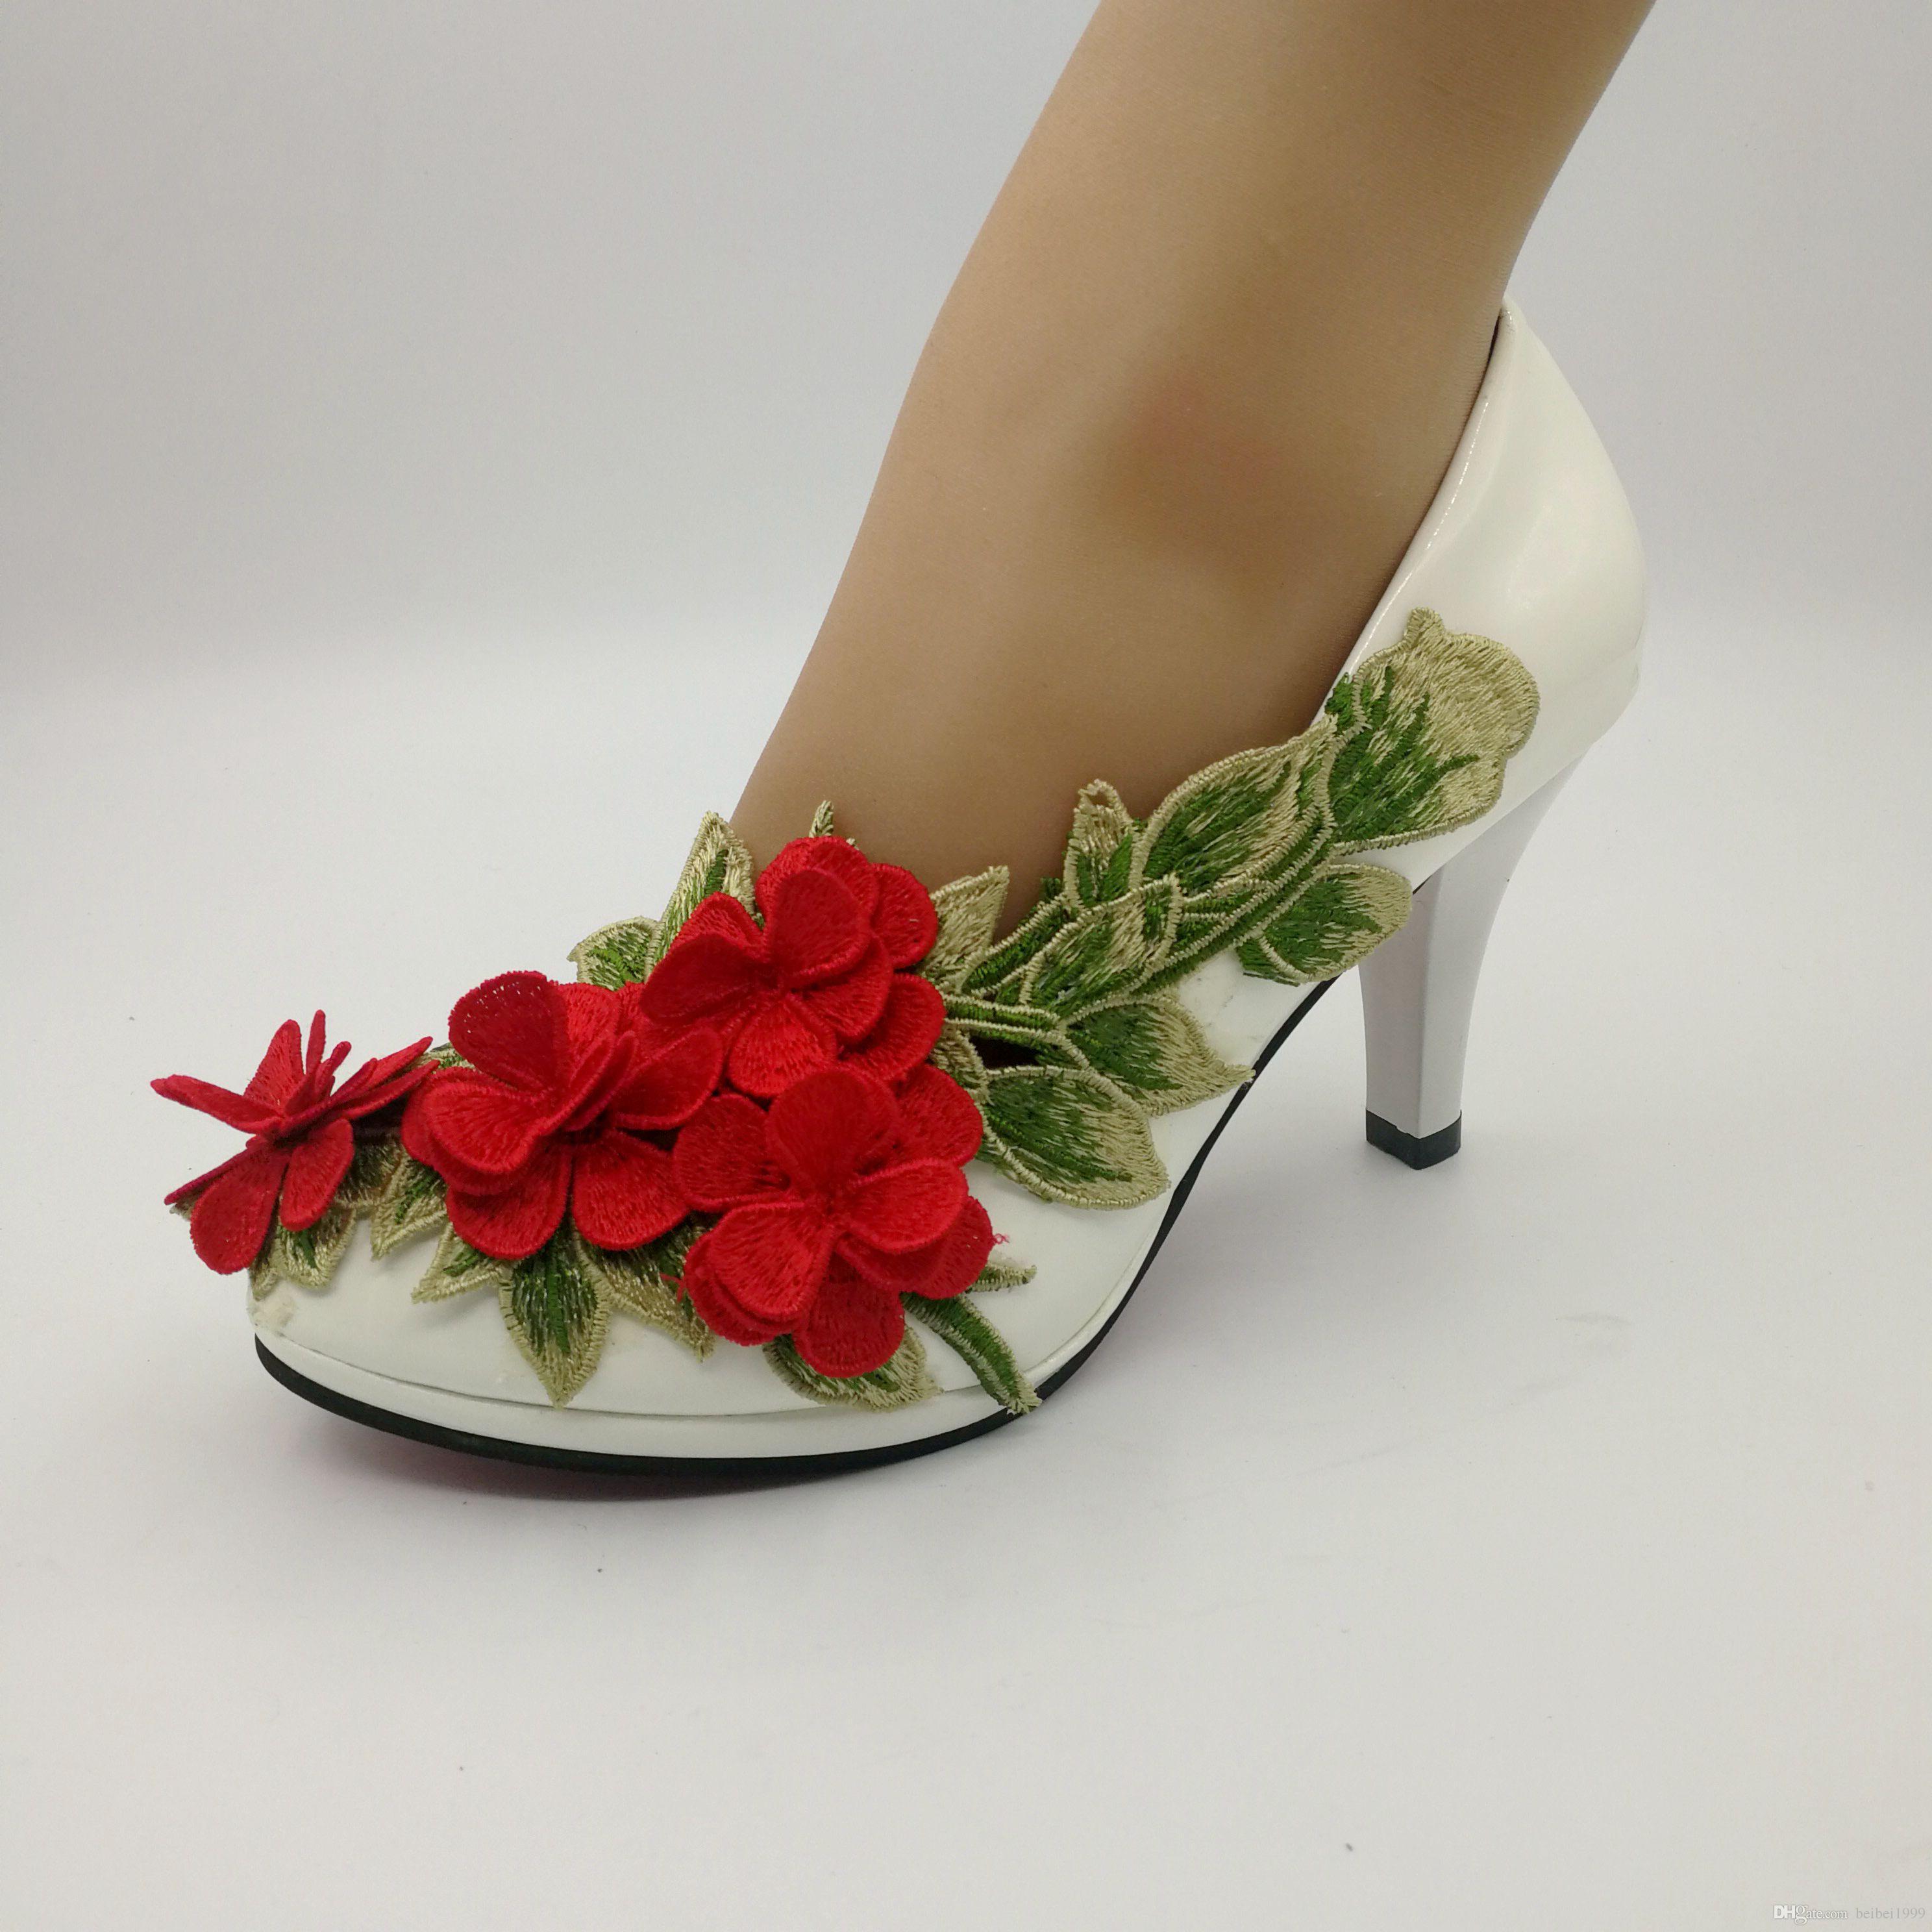 NEW Pump Lace Flower Bridal Shoes Wedding Party Dancing Shoes Beautiful Bridesmaid Shoes Women high heel size EU35-41